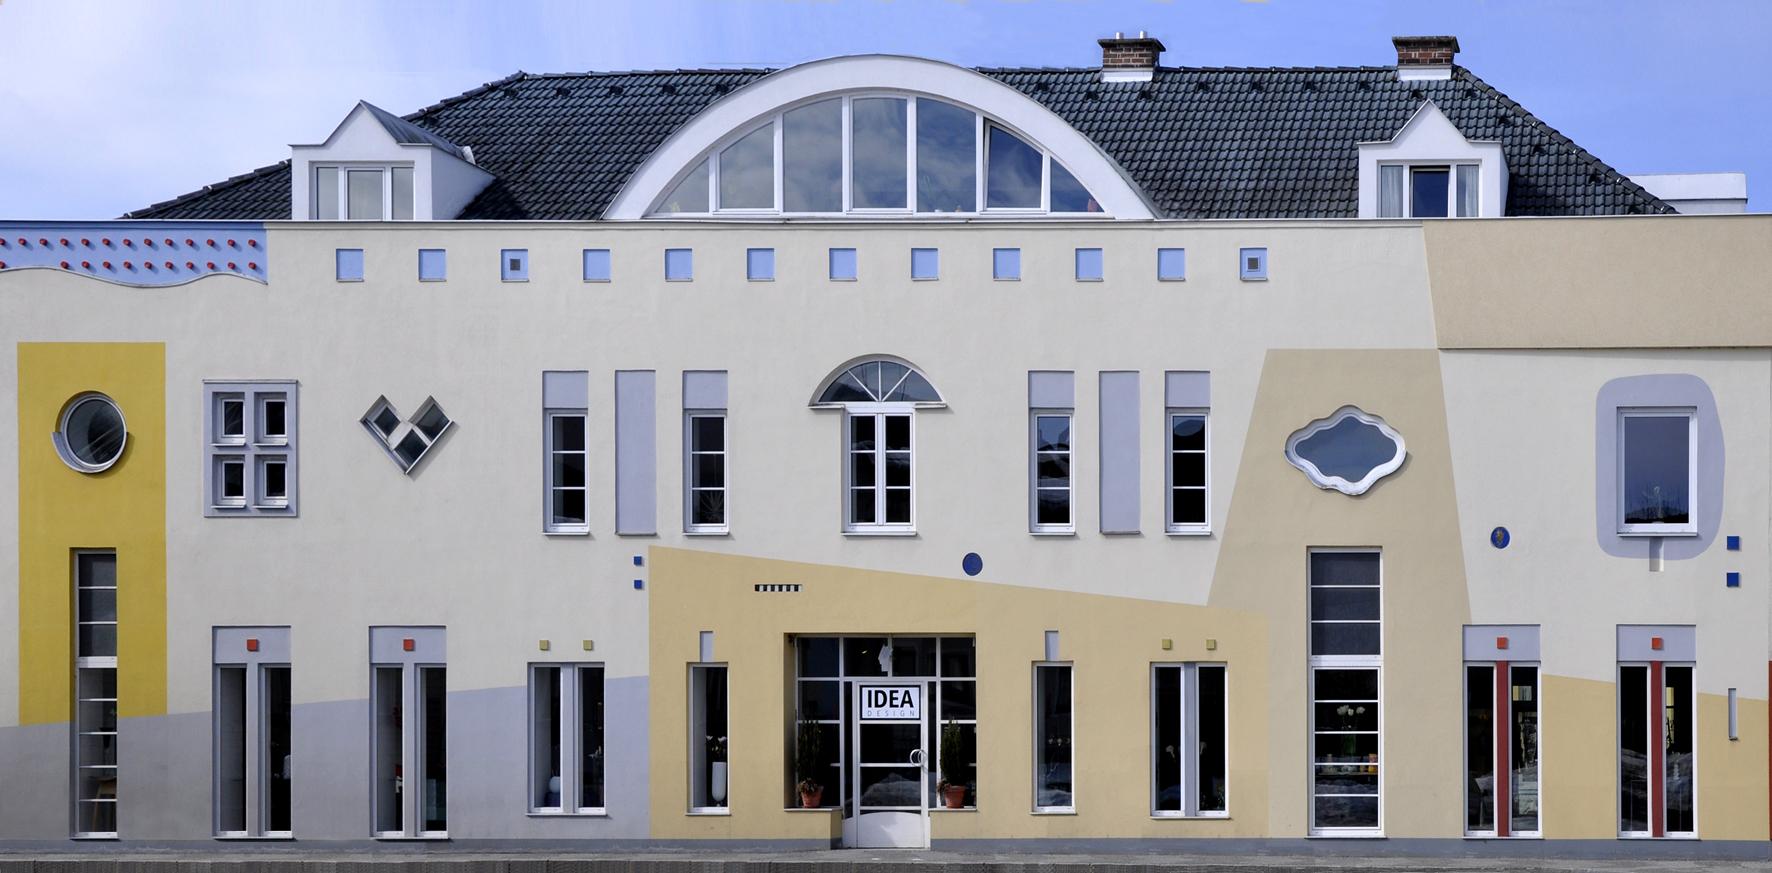 Ideahaus-01.jpg